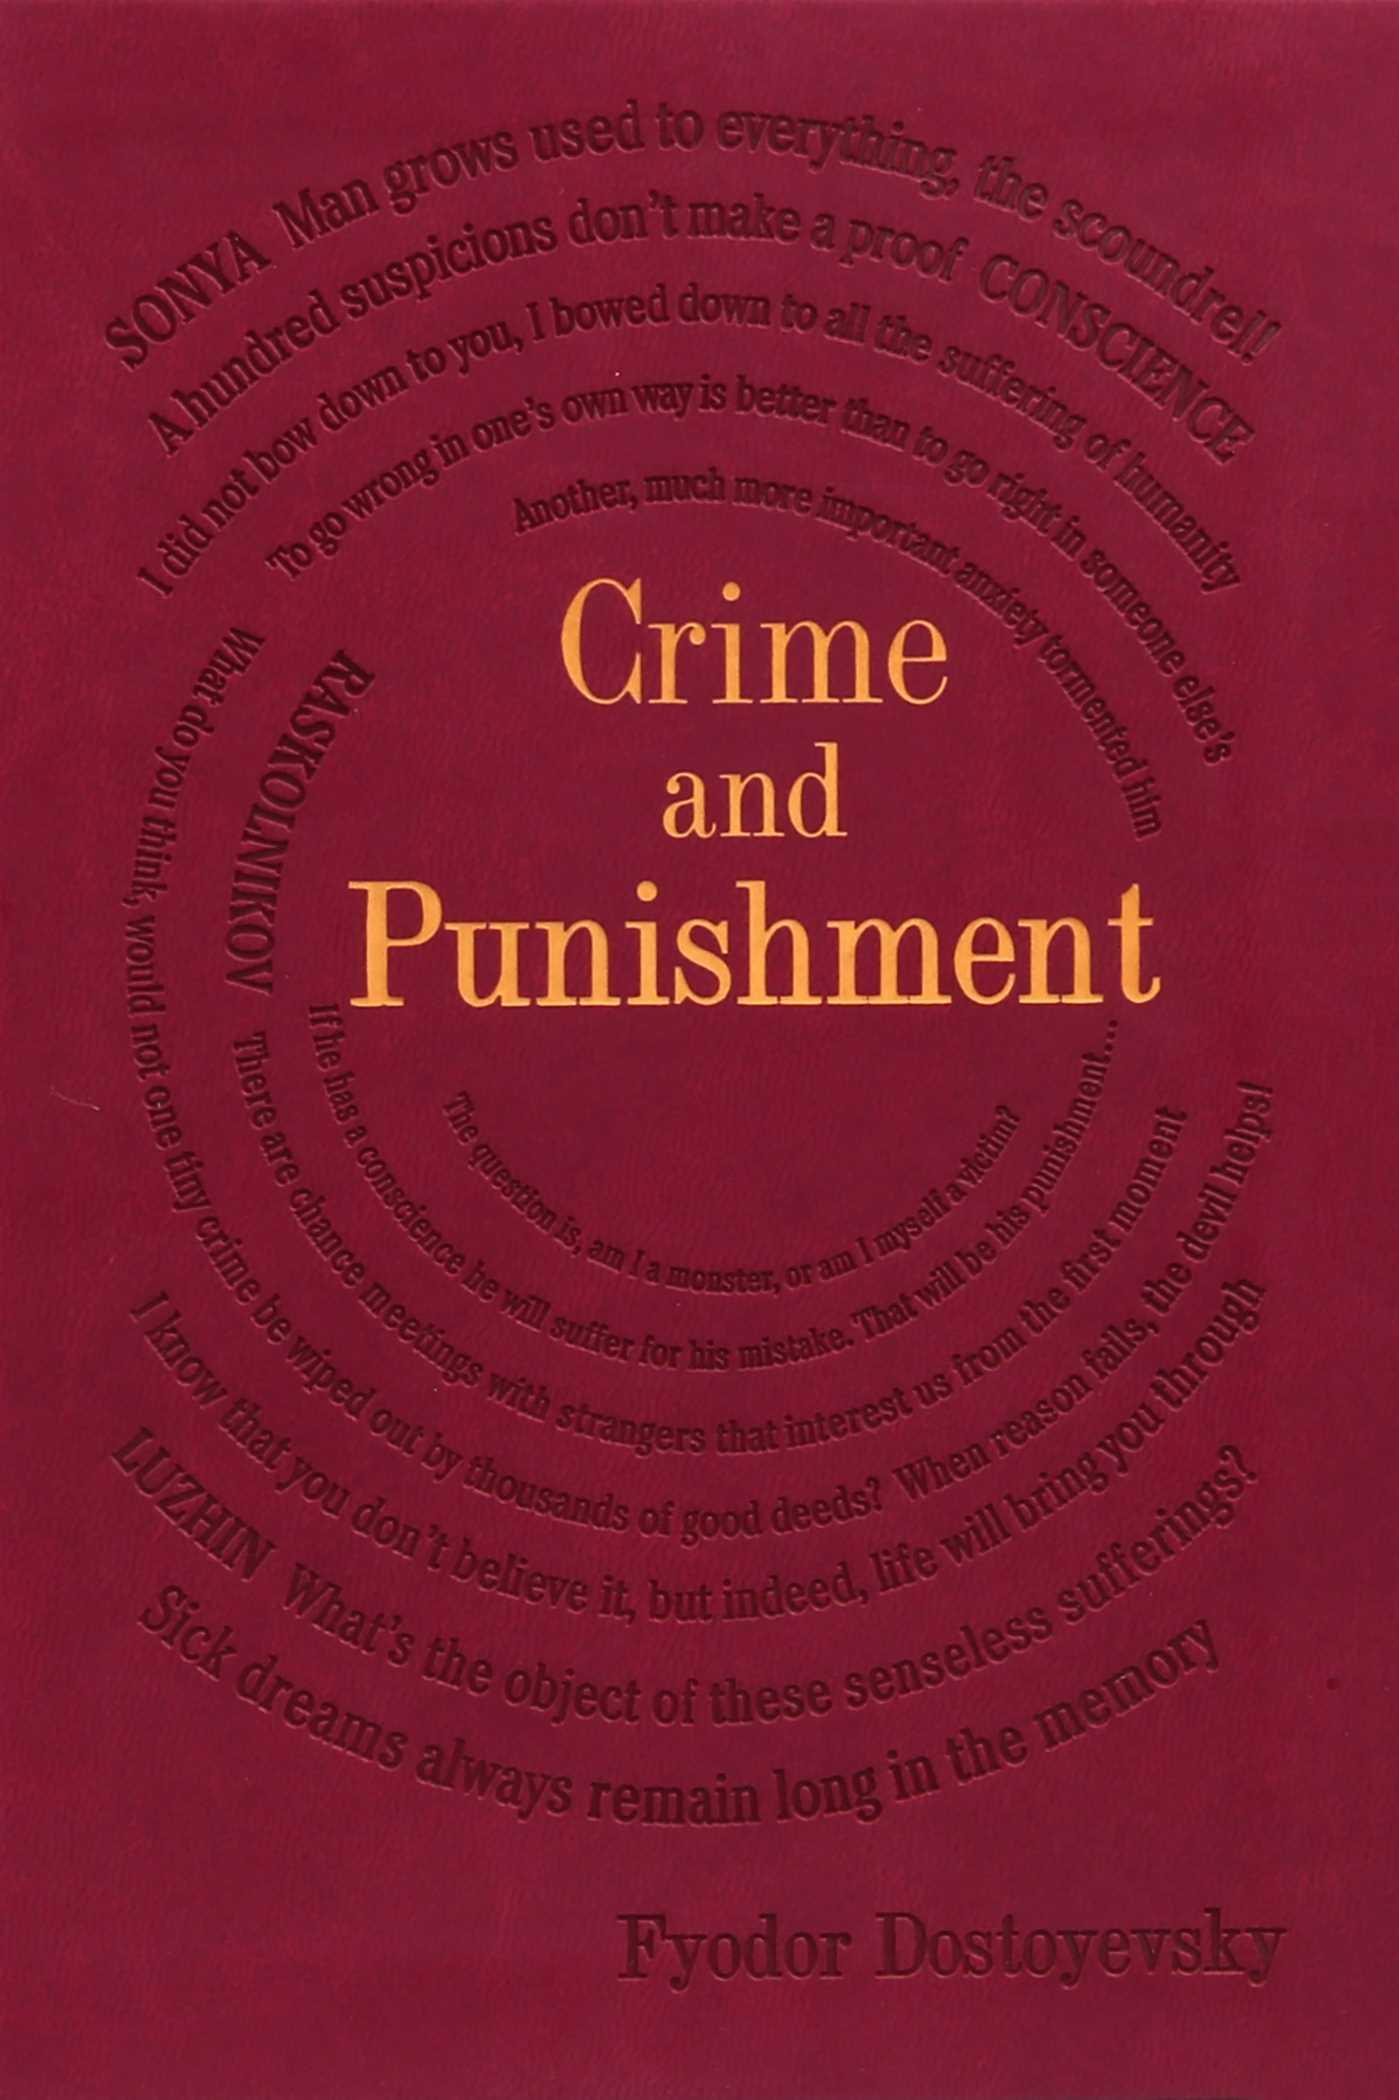 Crime and punishment 9781684122905 hr